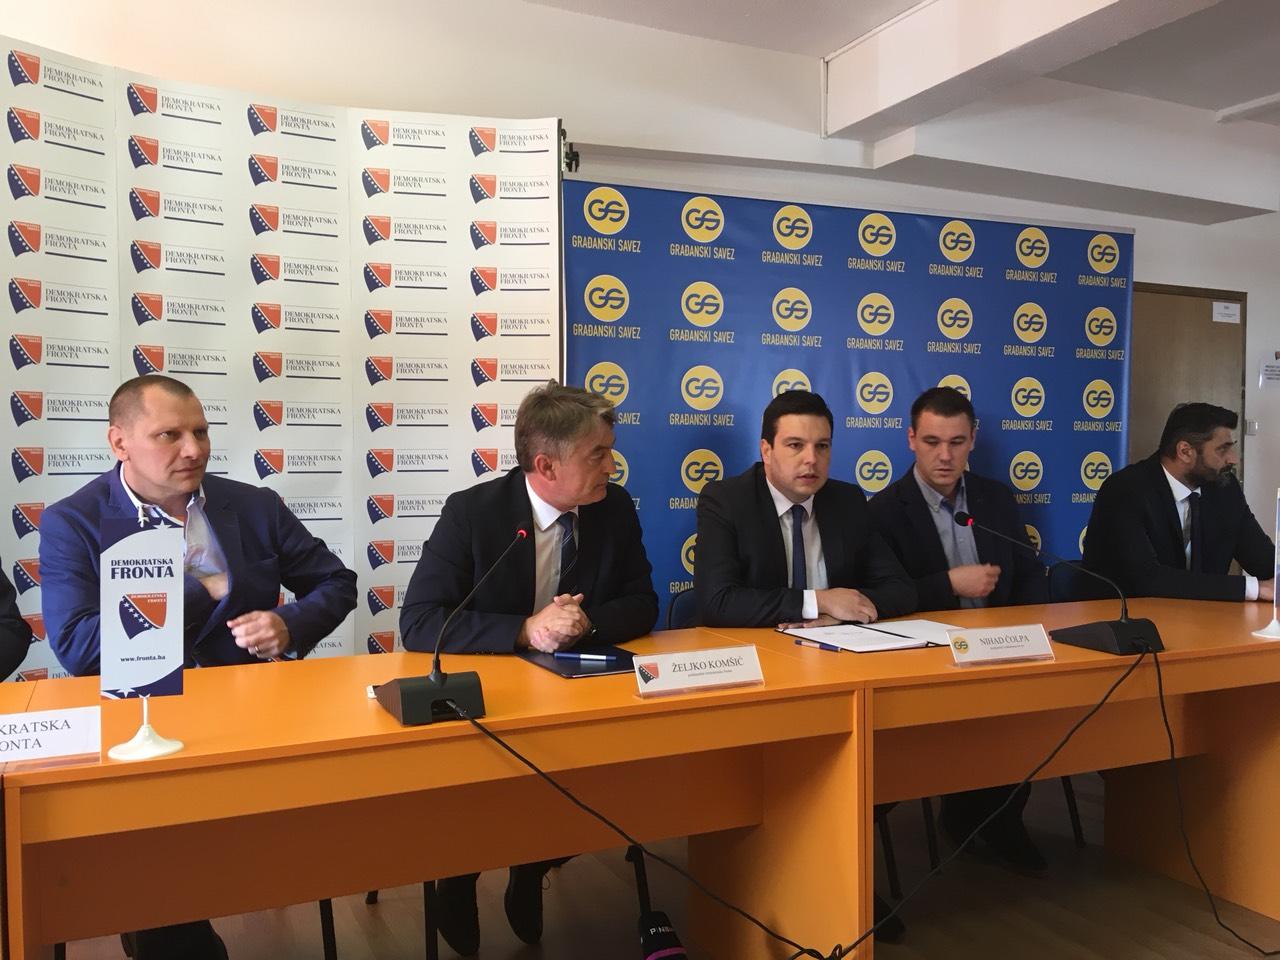 Demokratska fronta i Građanski savez potpisali koalicioni sporazum ...